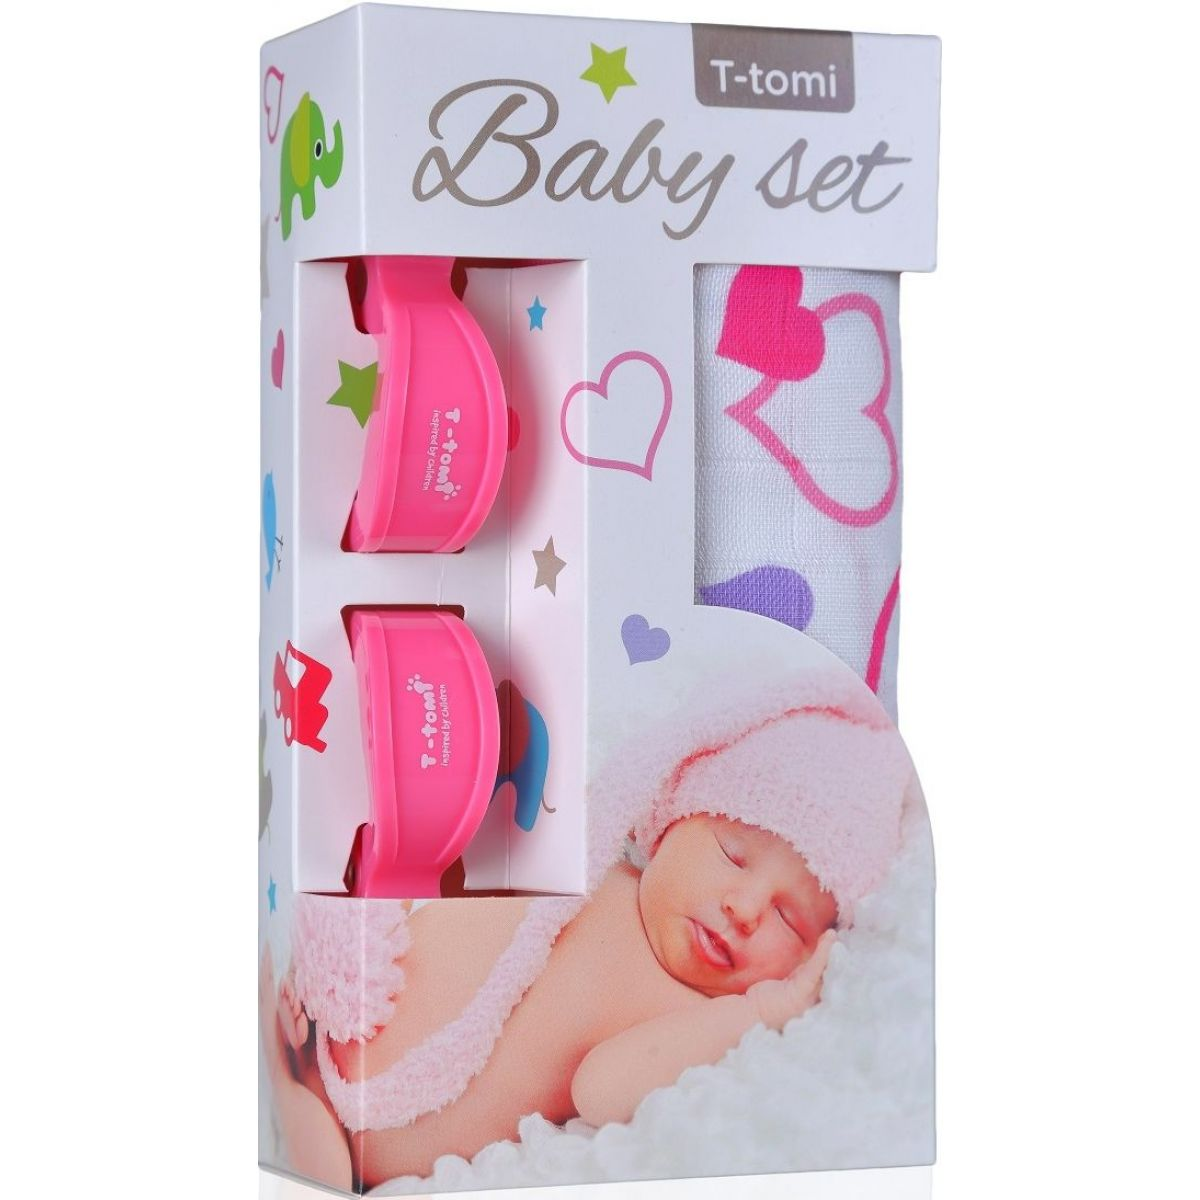 T-tomi Baby set Bambusová BIO osuška srdíčka a kočárkový kolíček růžový